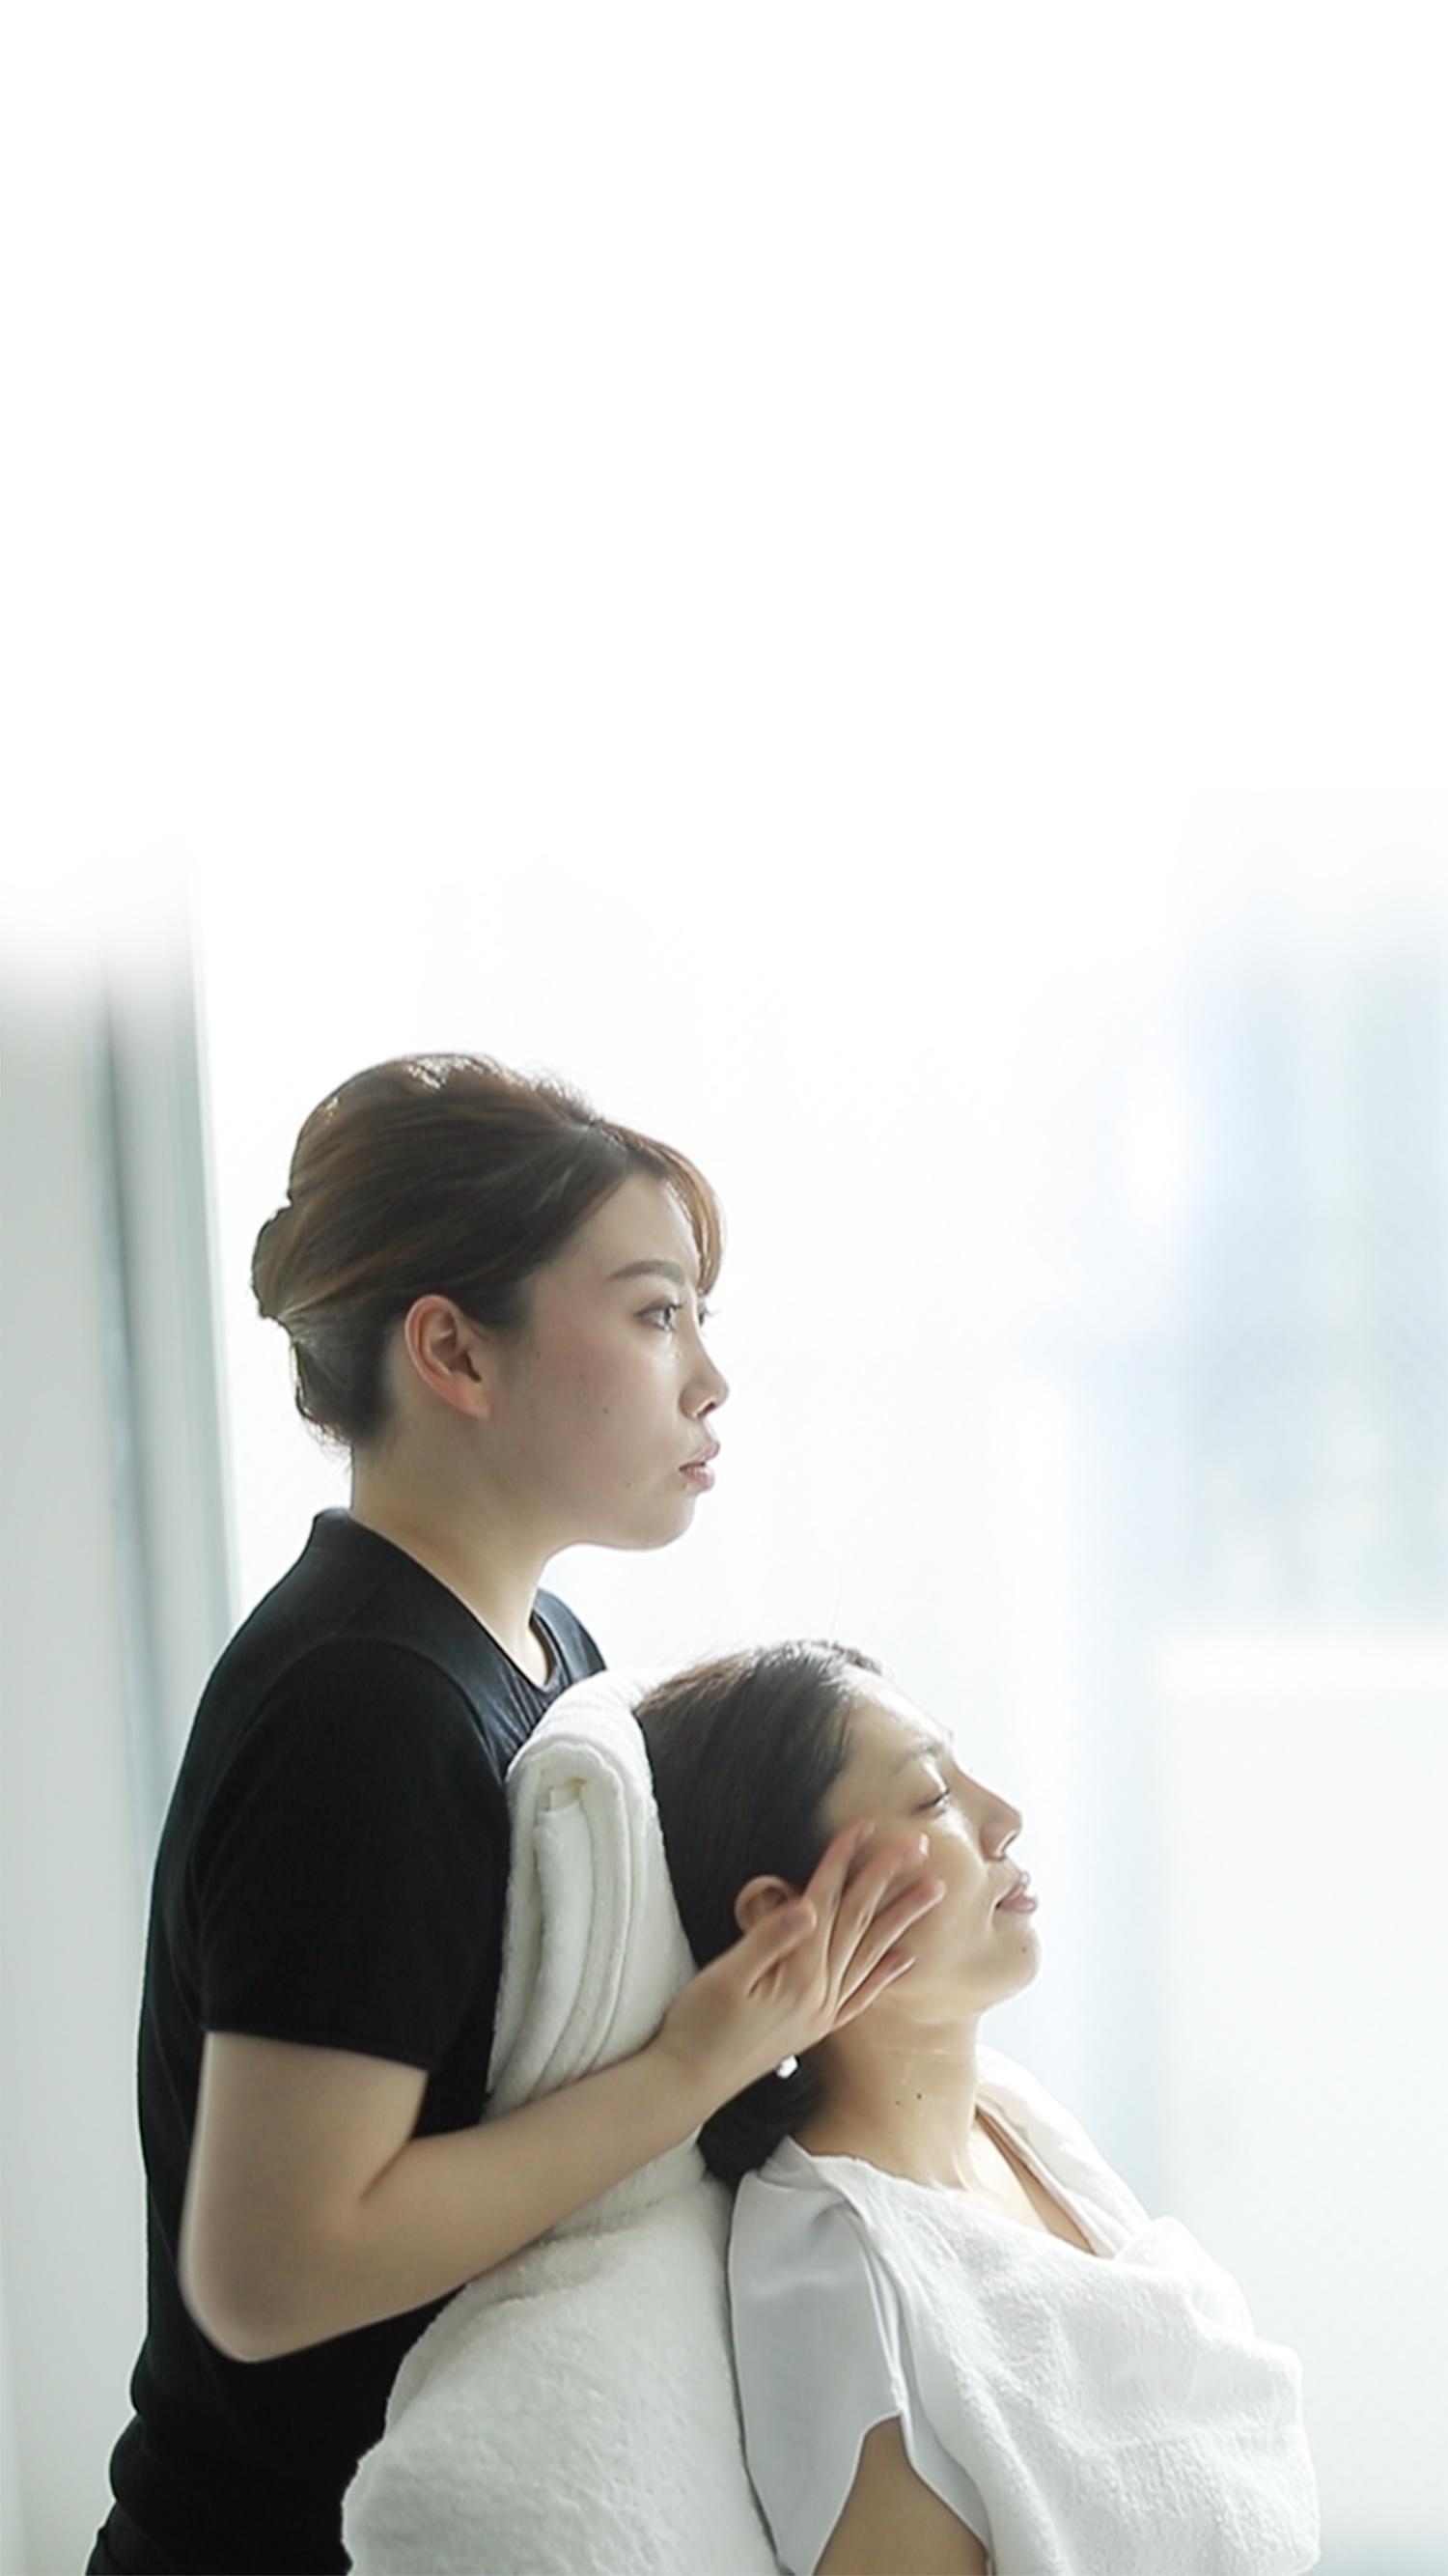 静岡市の痩身・小顔専門エステ施術風景01